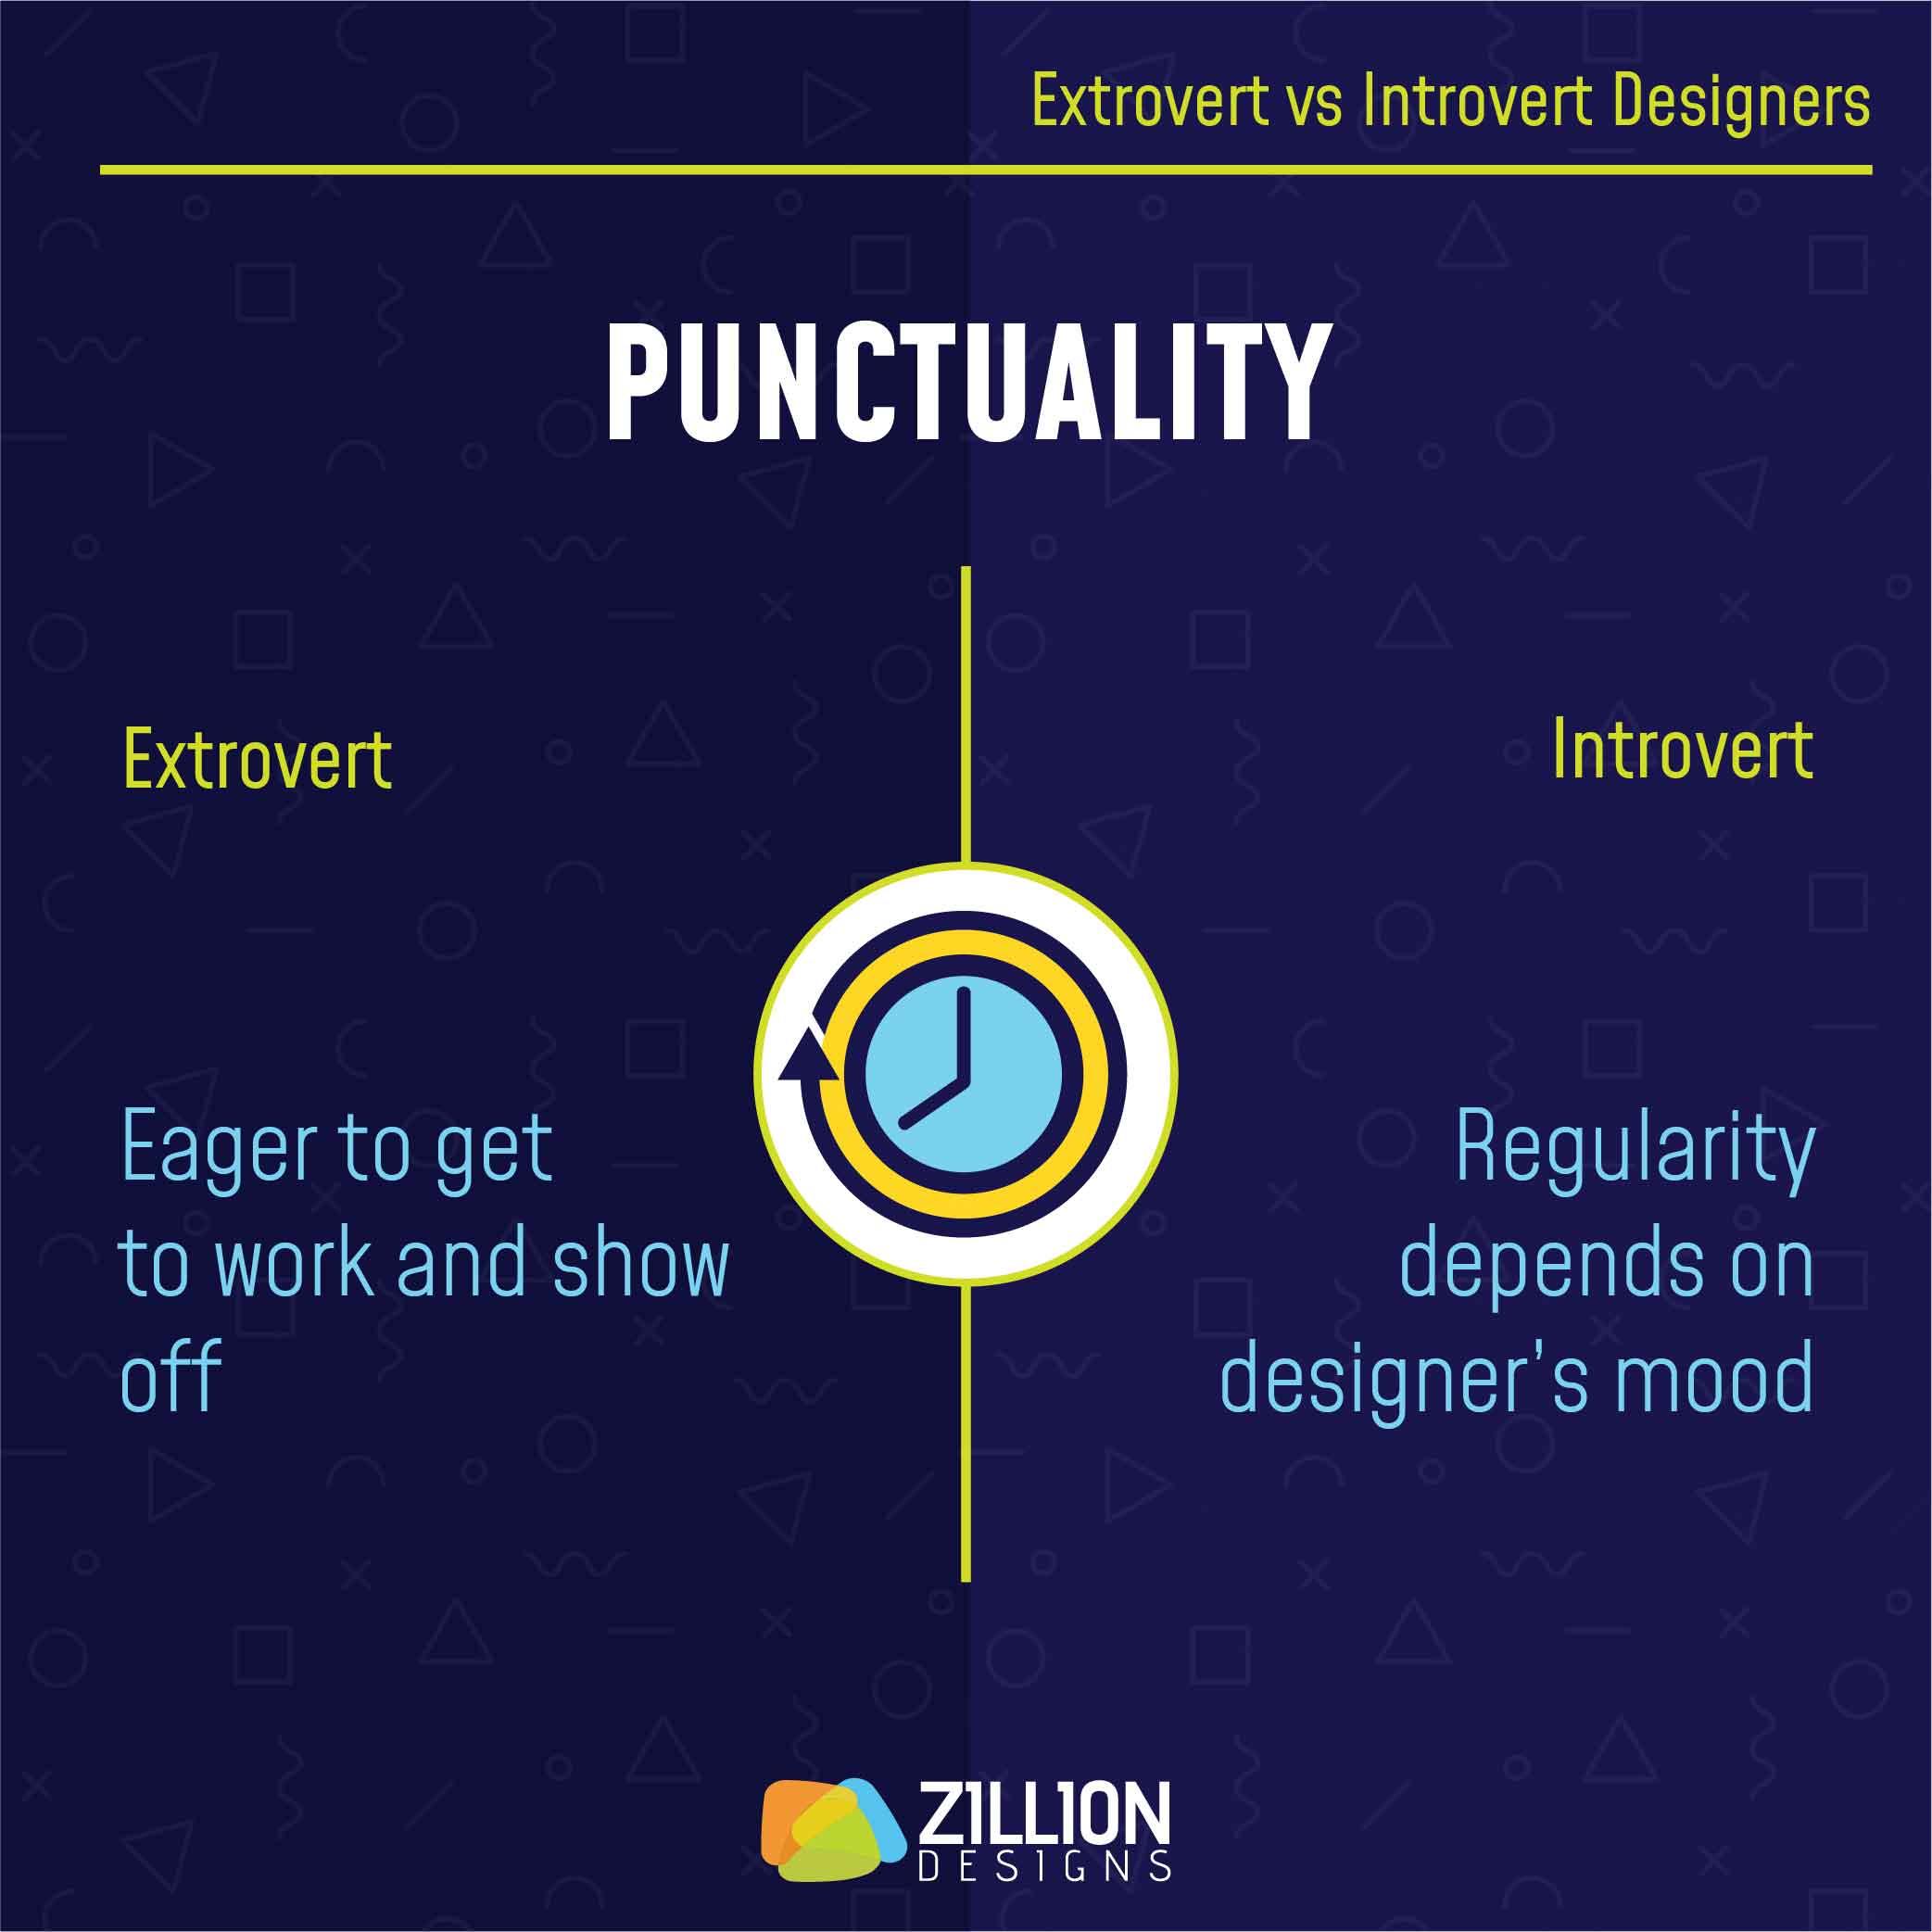 Extrovert vs Introvert Designers 8